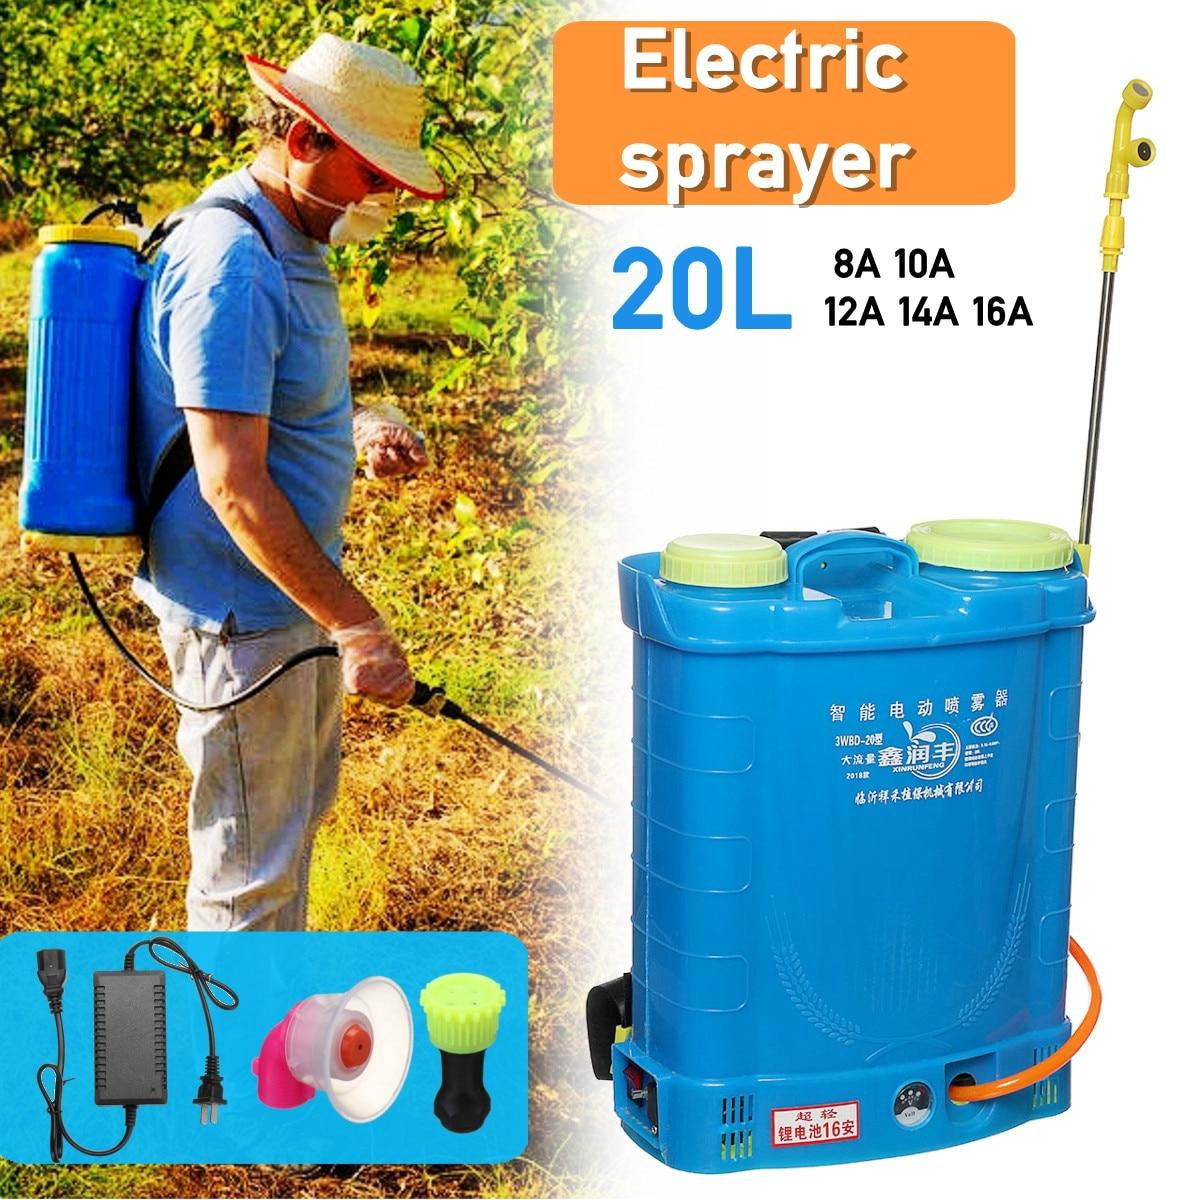 Bateria De Lítio Inteligente pulverizador Elétrico pulverizador de Pesticidas Agrícolas 20L dispensador de carga de Alta pressão equipamento de Jardim